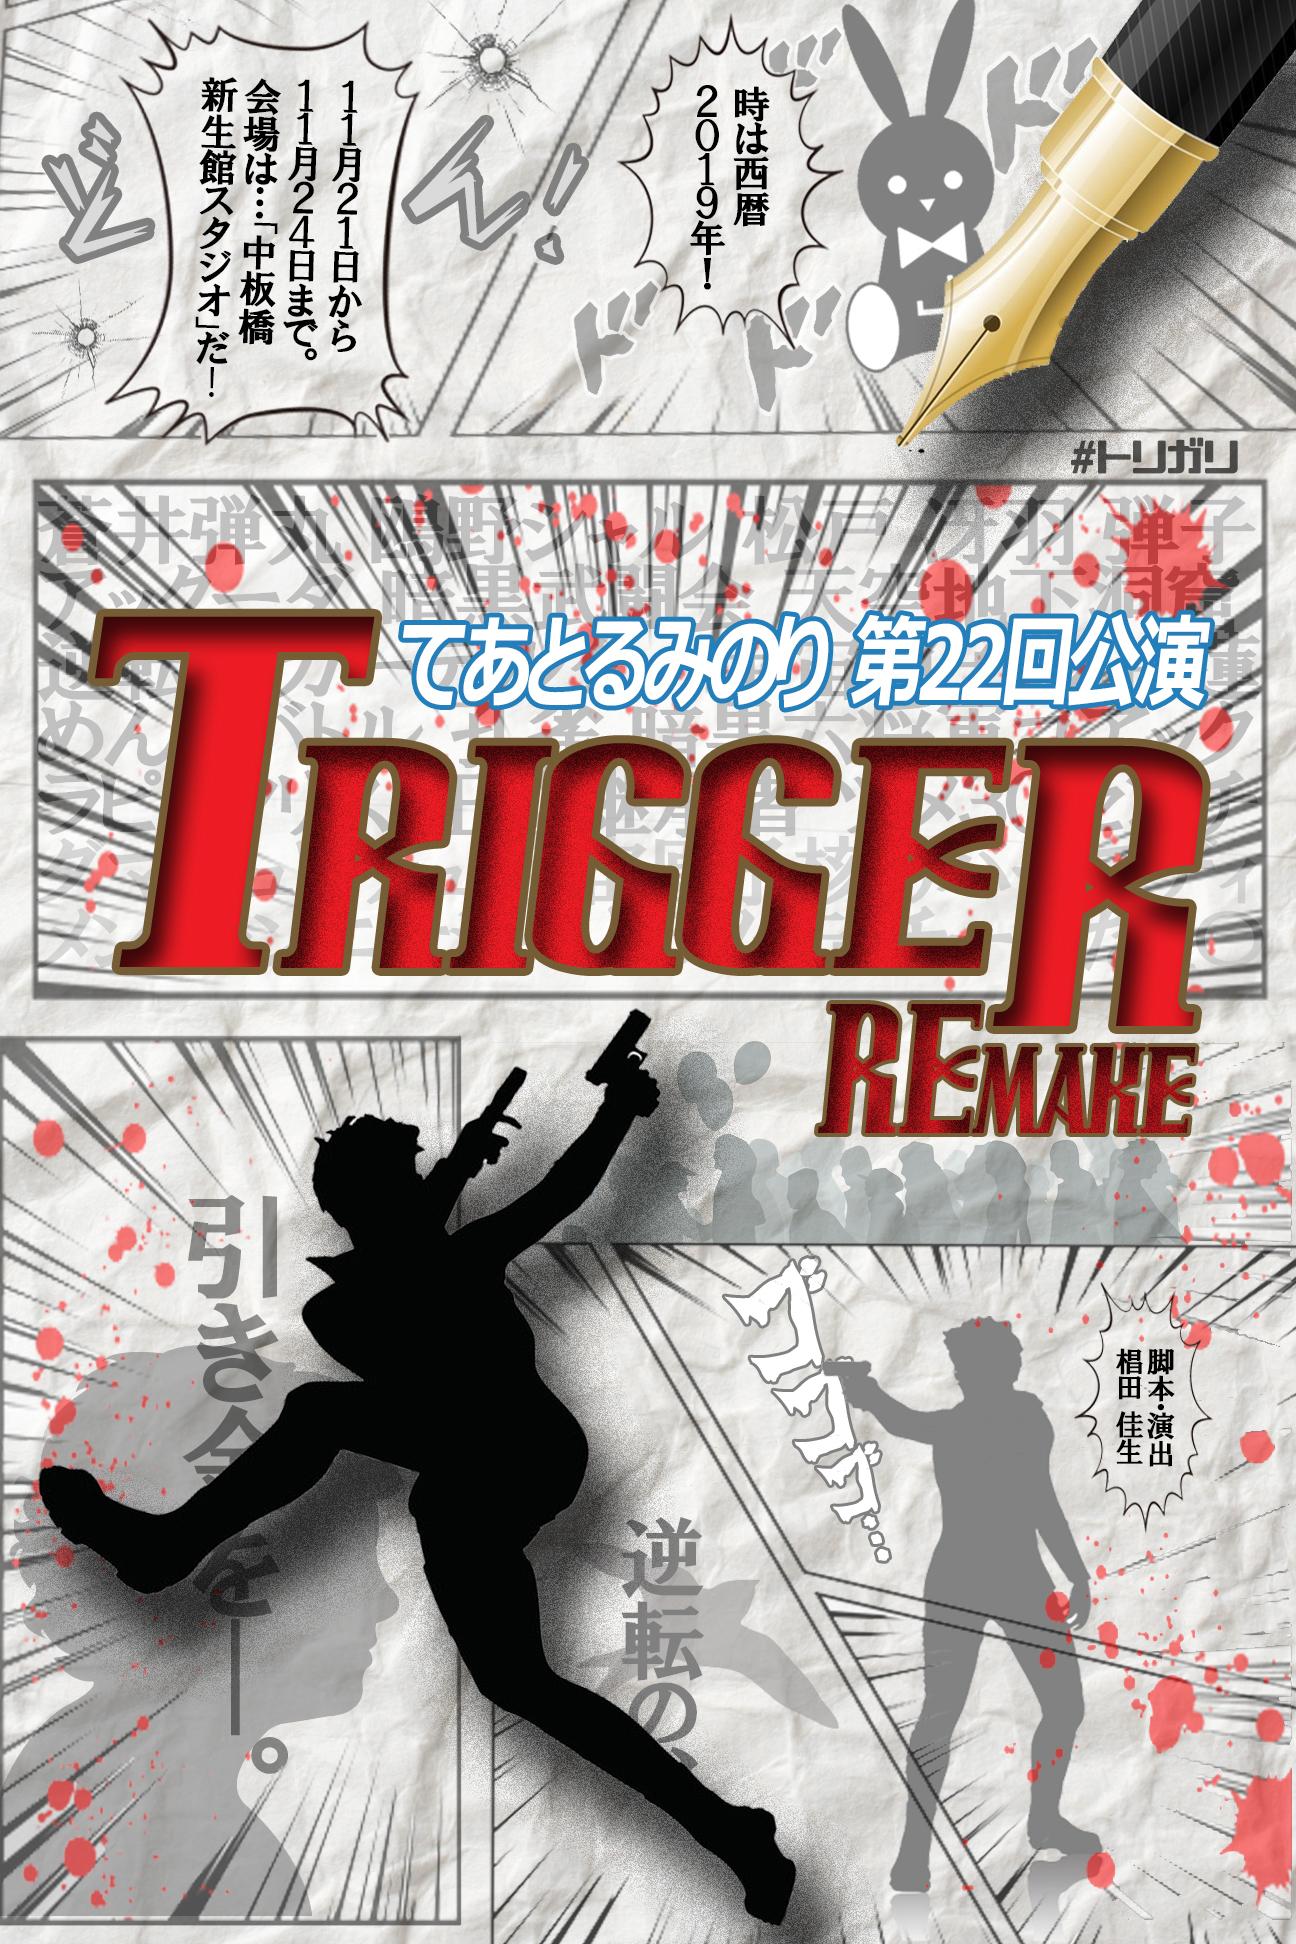 22trigger_remake.jpg